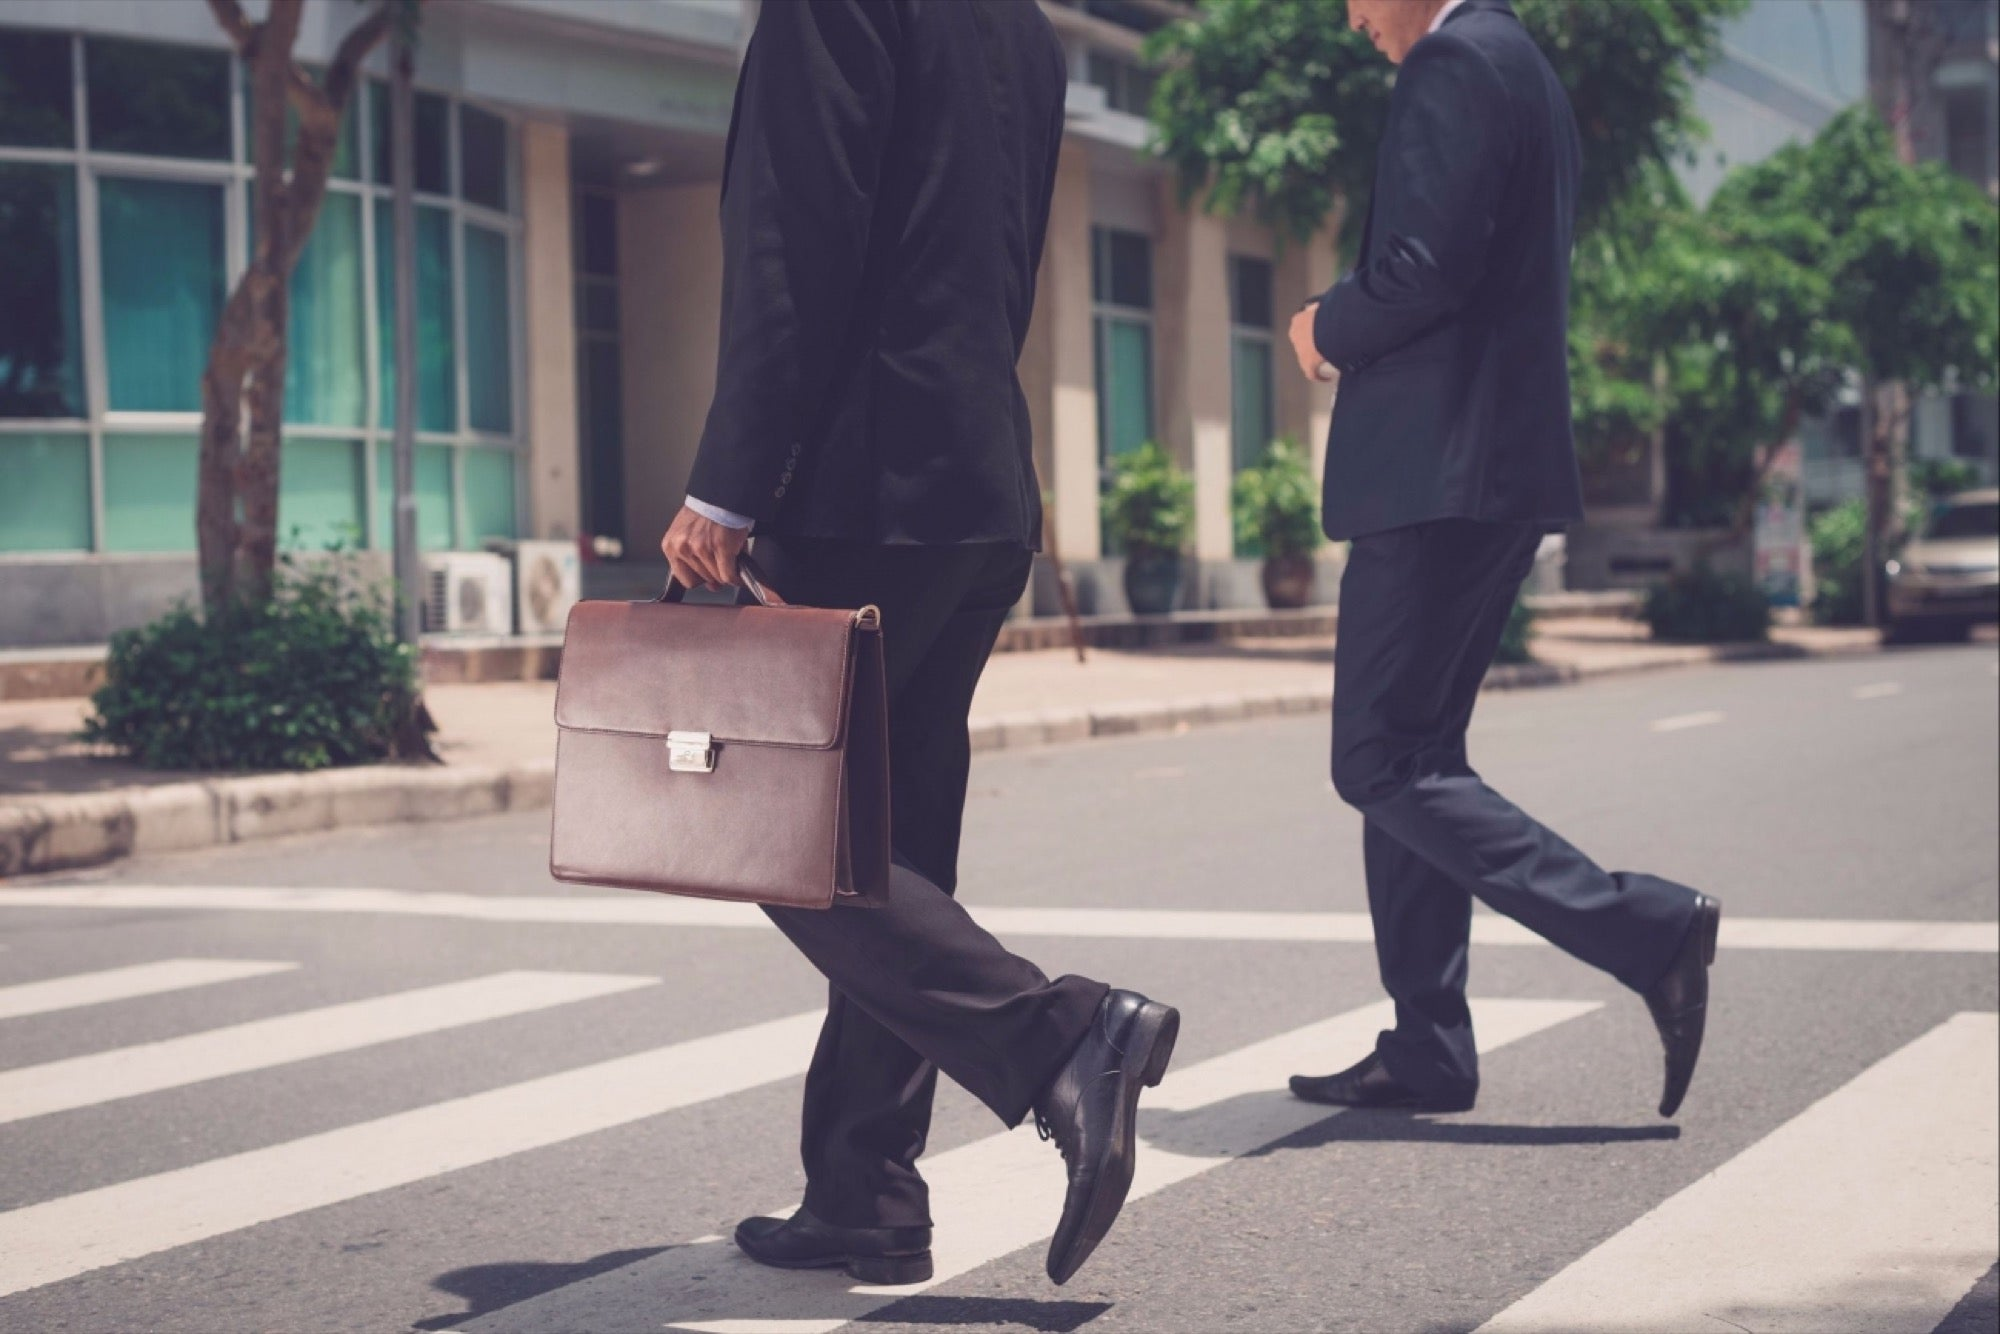 20160606131115 businessmen walking suitcase leaving downsizing.jpeg